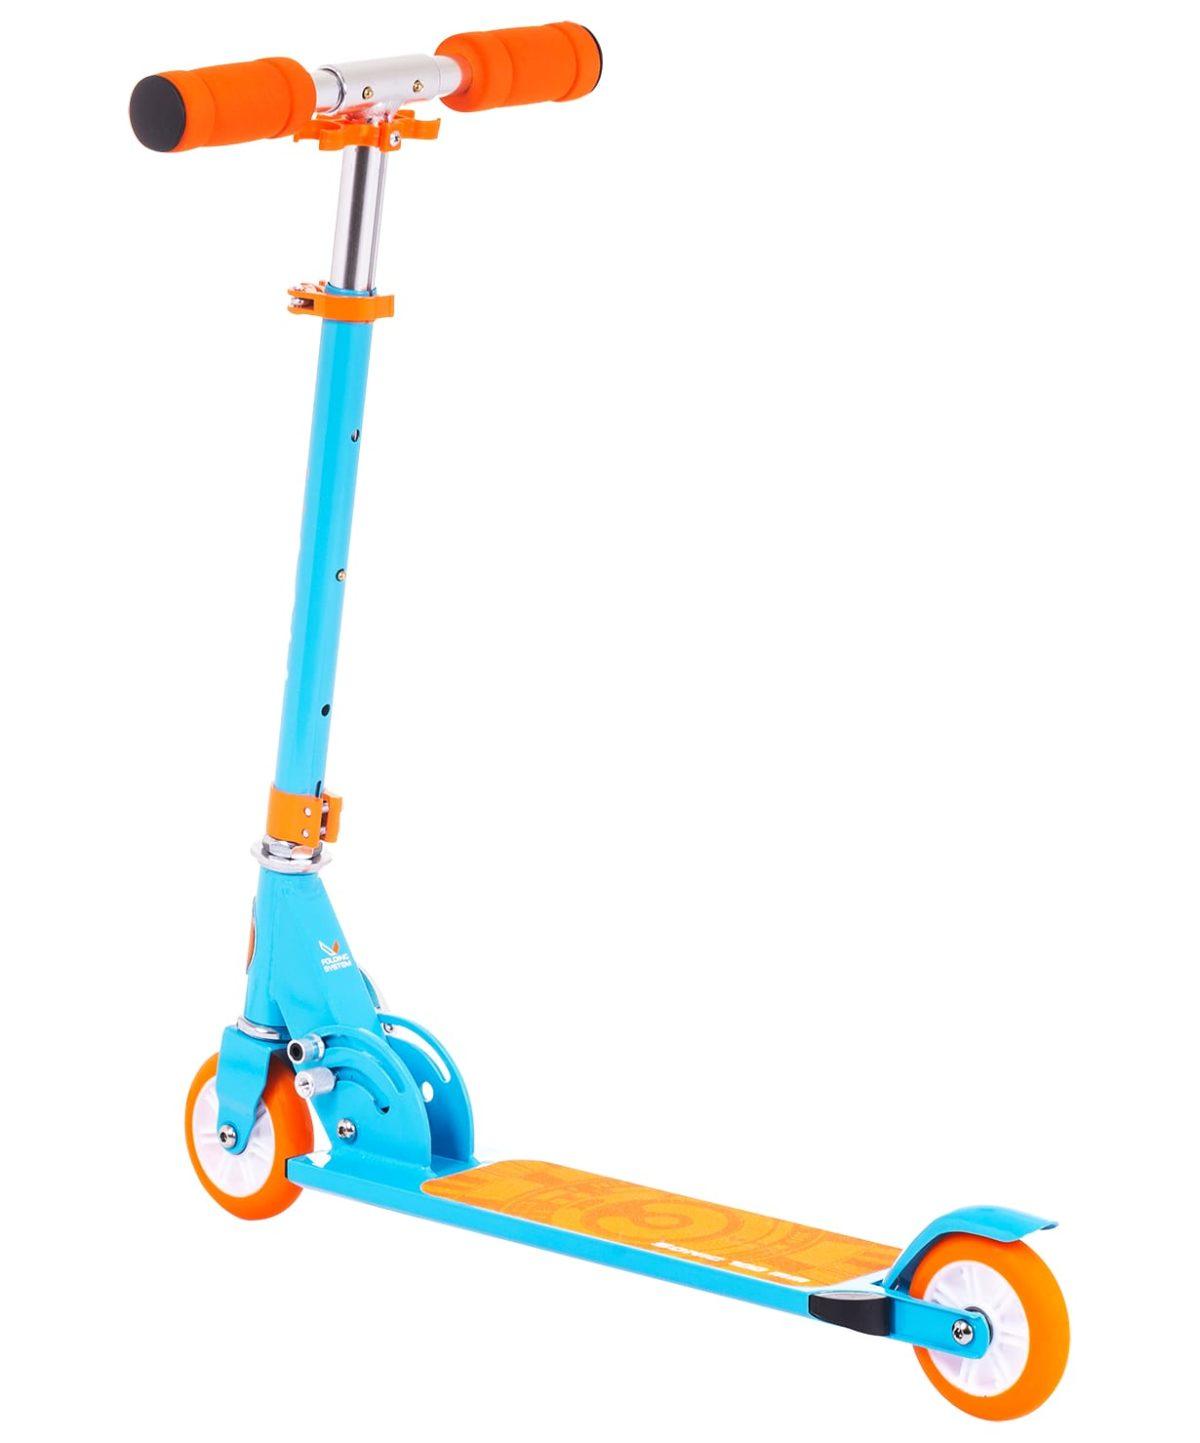 RIDEX Sonic Самокат 2-колесный  100 мм  Sonic: синий - 2